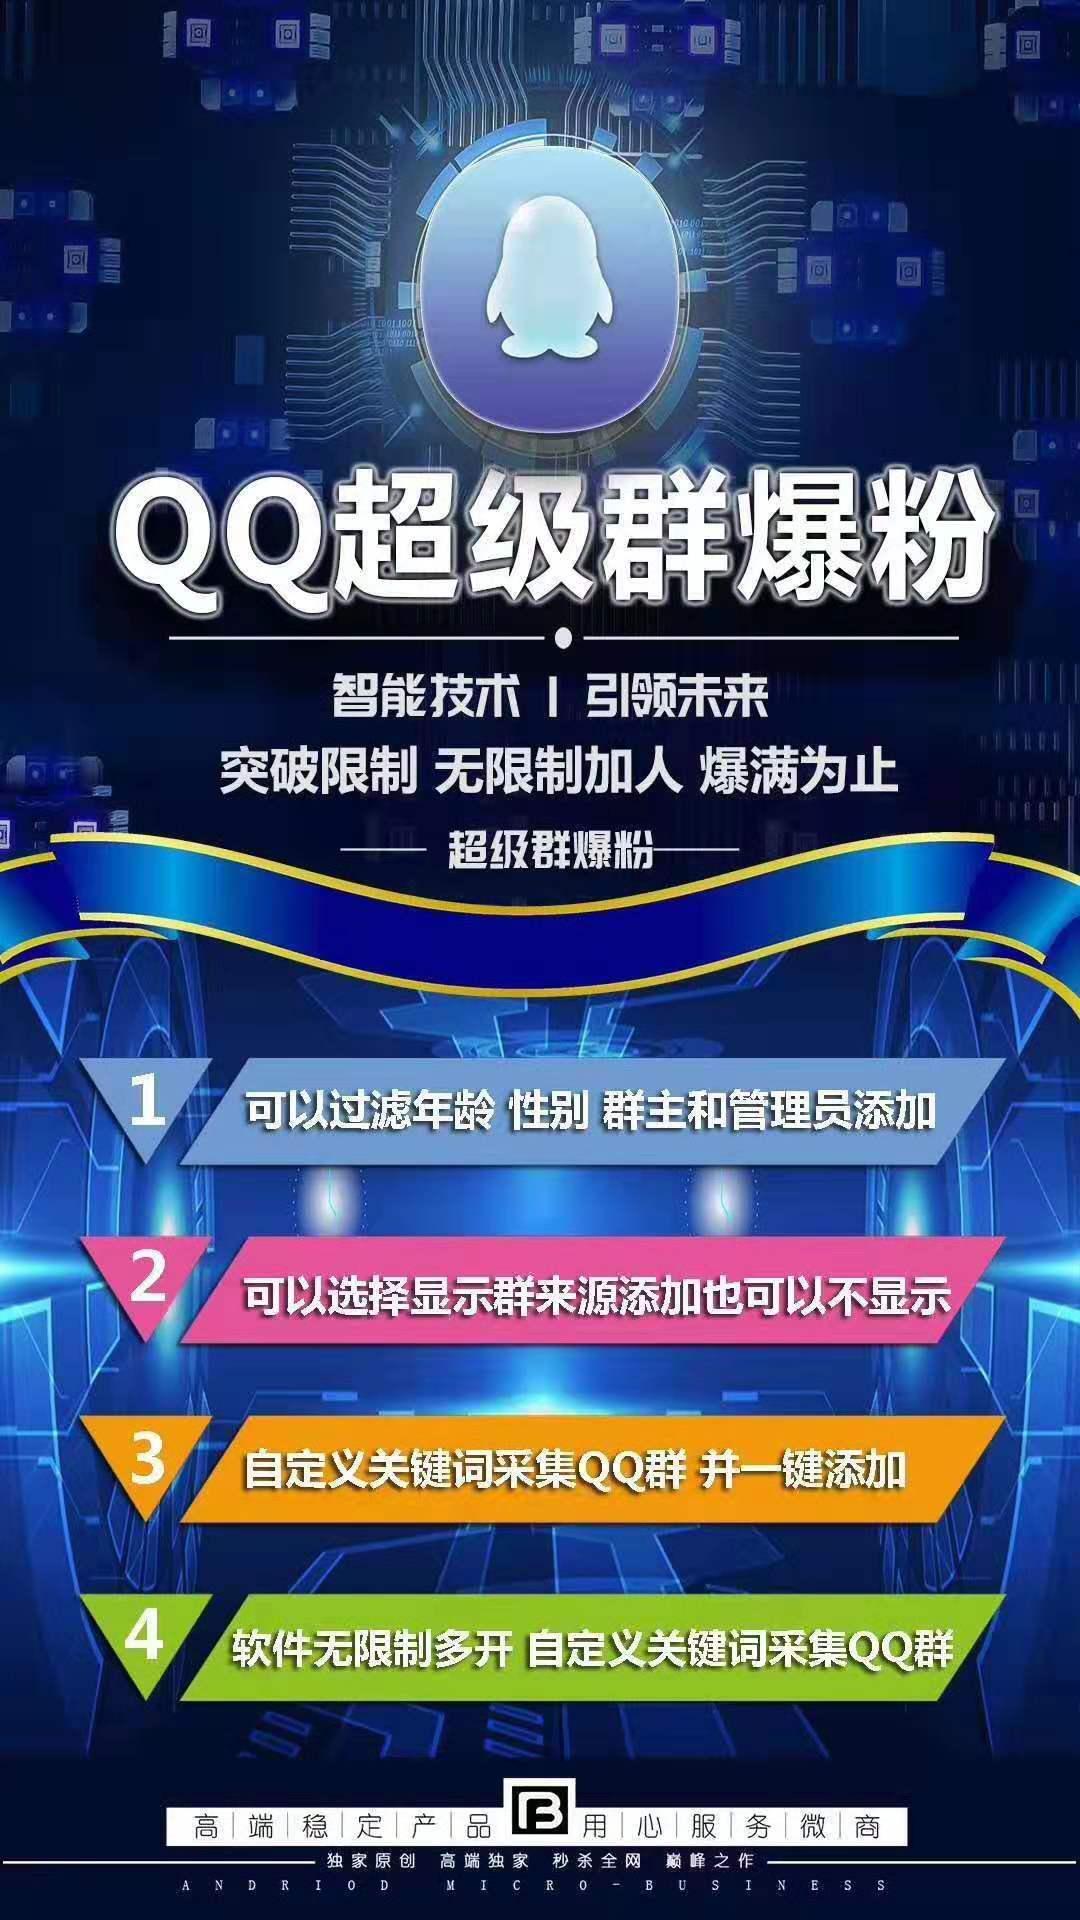 【QQ超级群爆粉】年卡QQ爆粉神器每日爆500人 QQ爆粉正版激活码授权